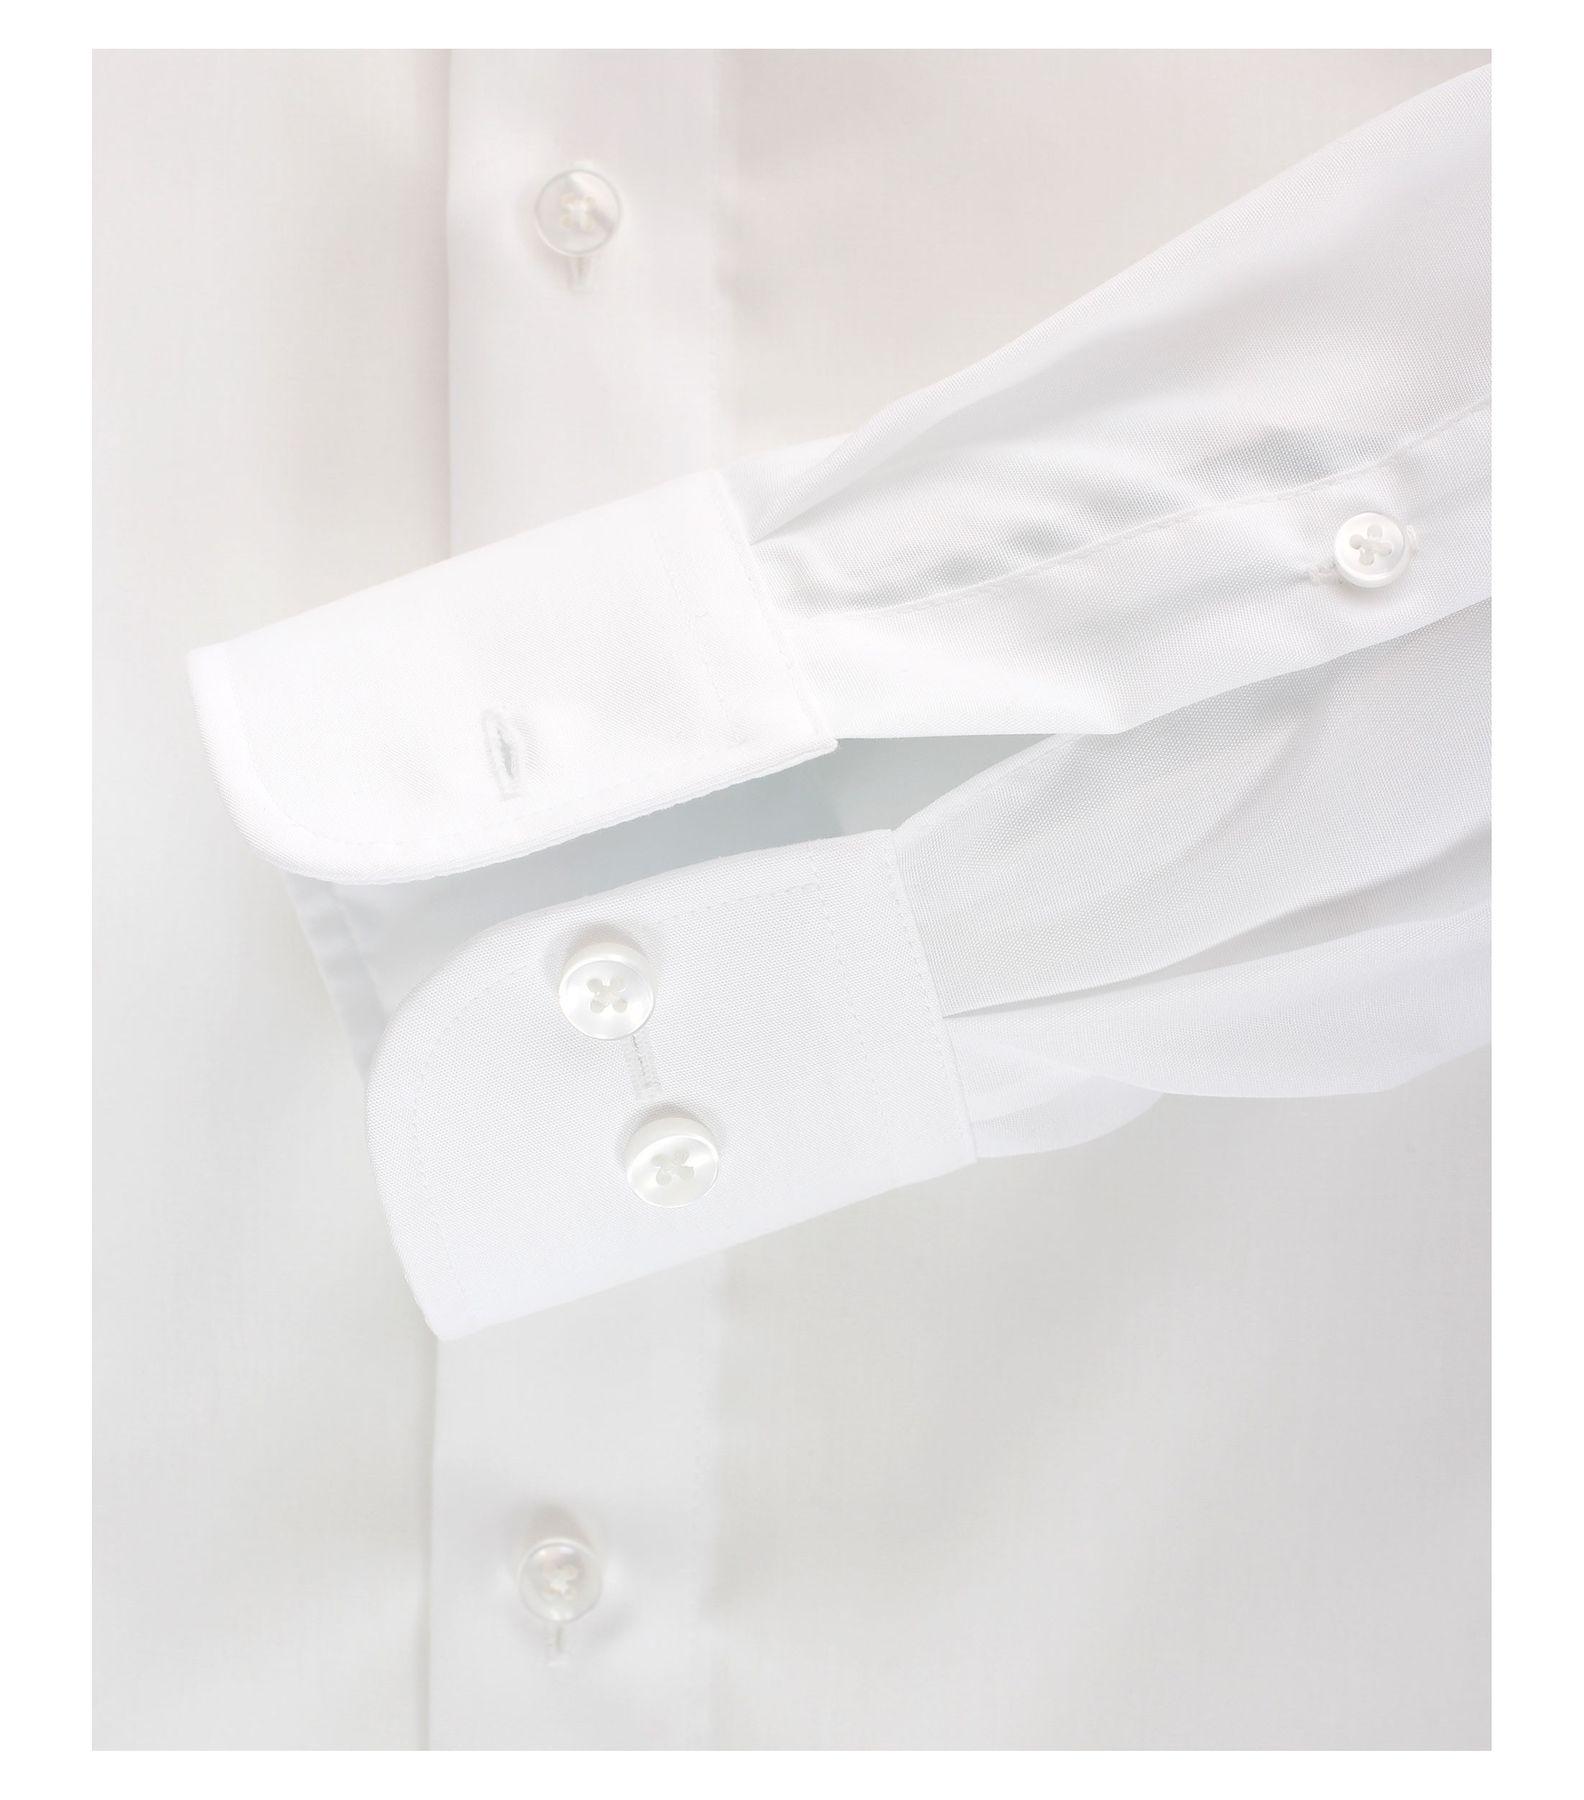 Casa Moda - Comfort Fit - Bügelfreies Herren Business Langarm Hemd verschiedene Farben (006060A) – Bild 12